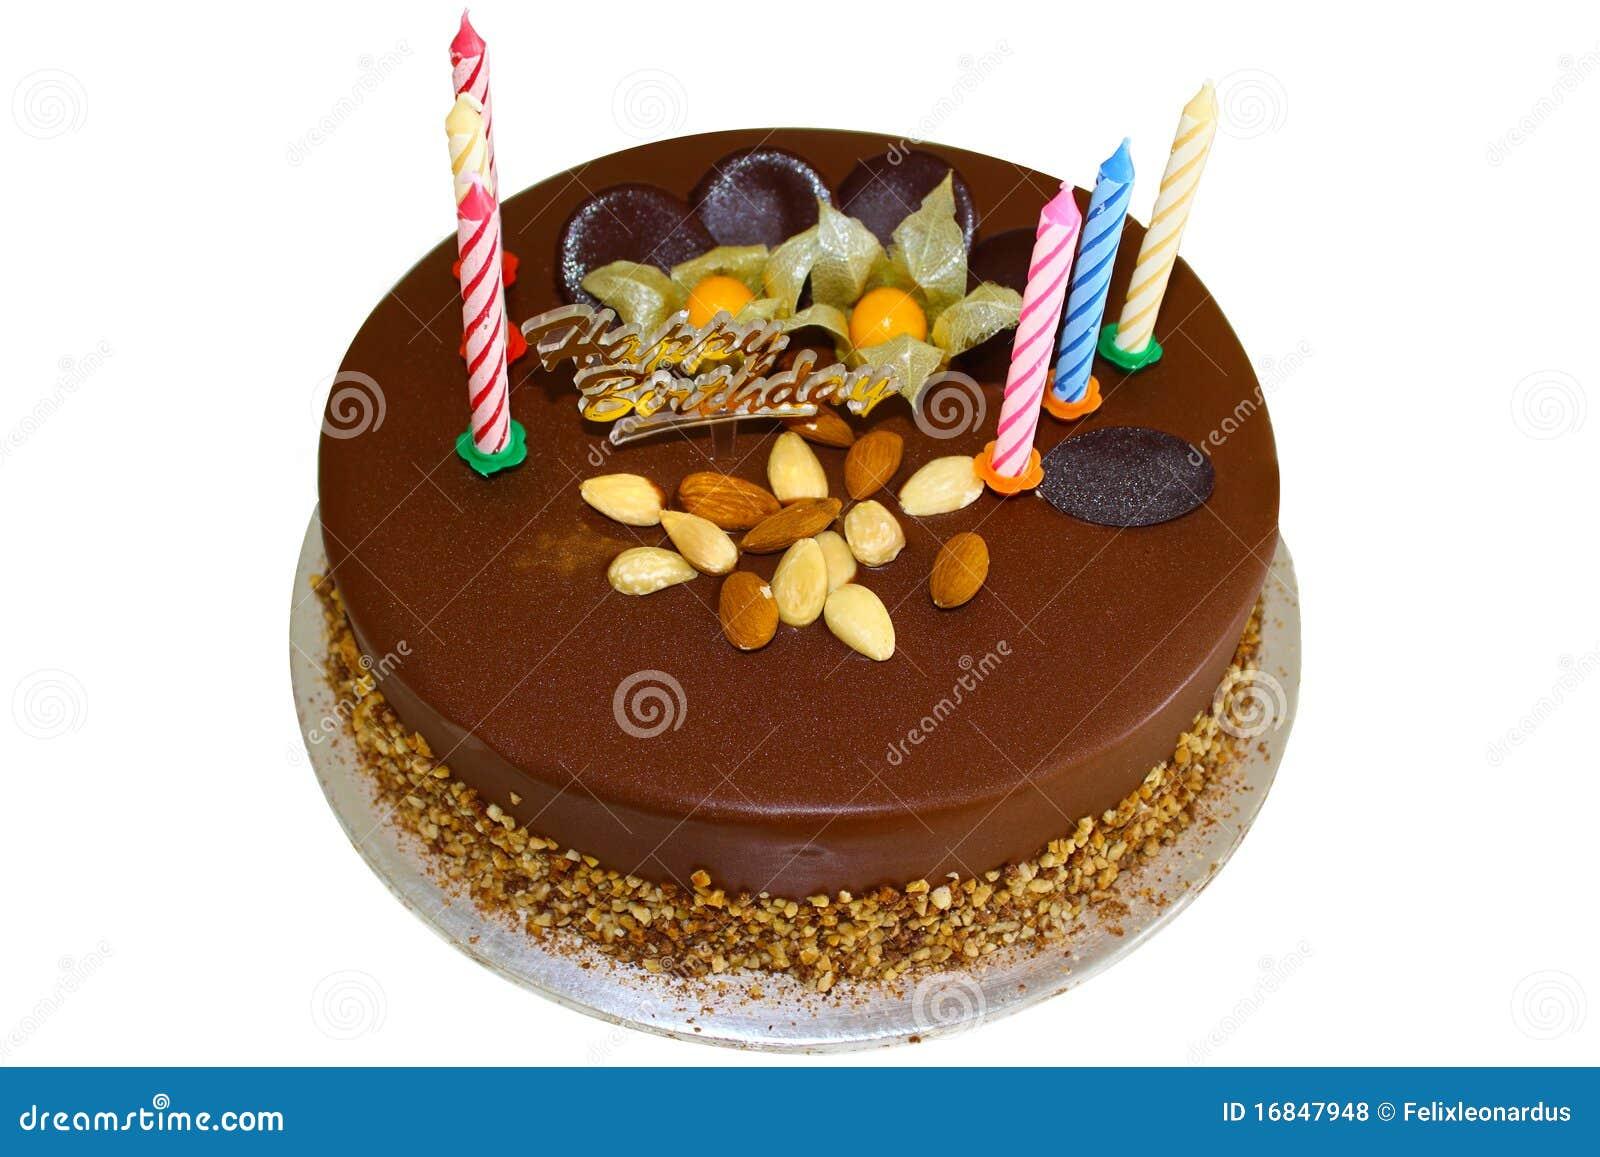 Chocolate Birthday Cake With Almond